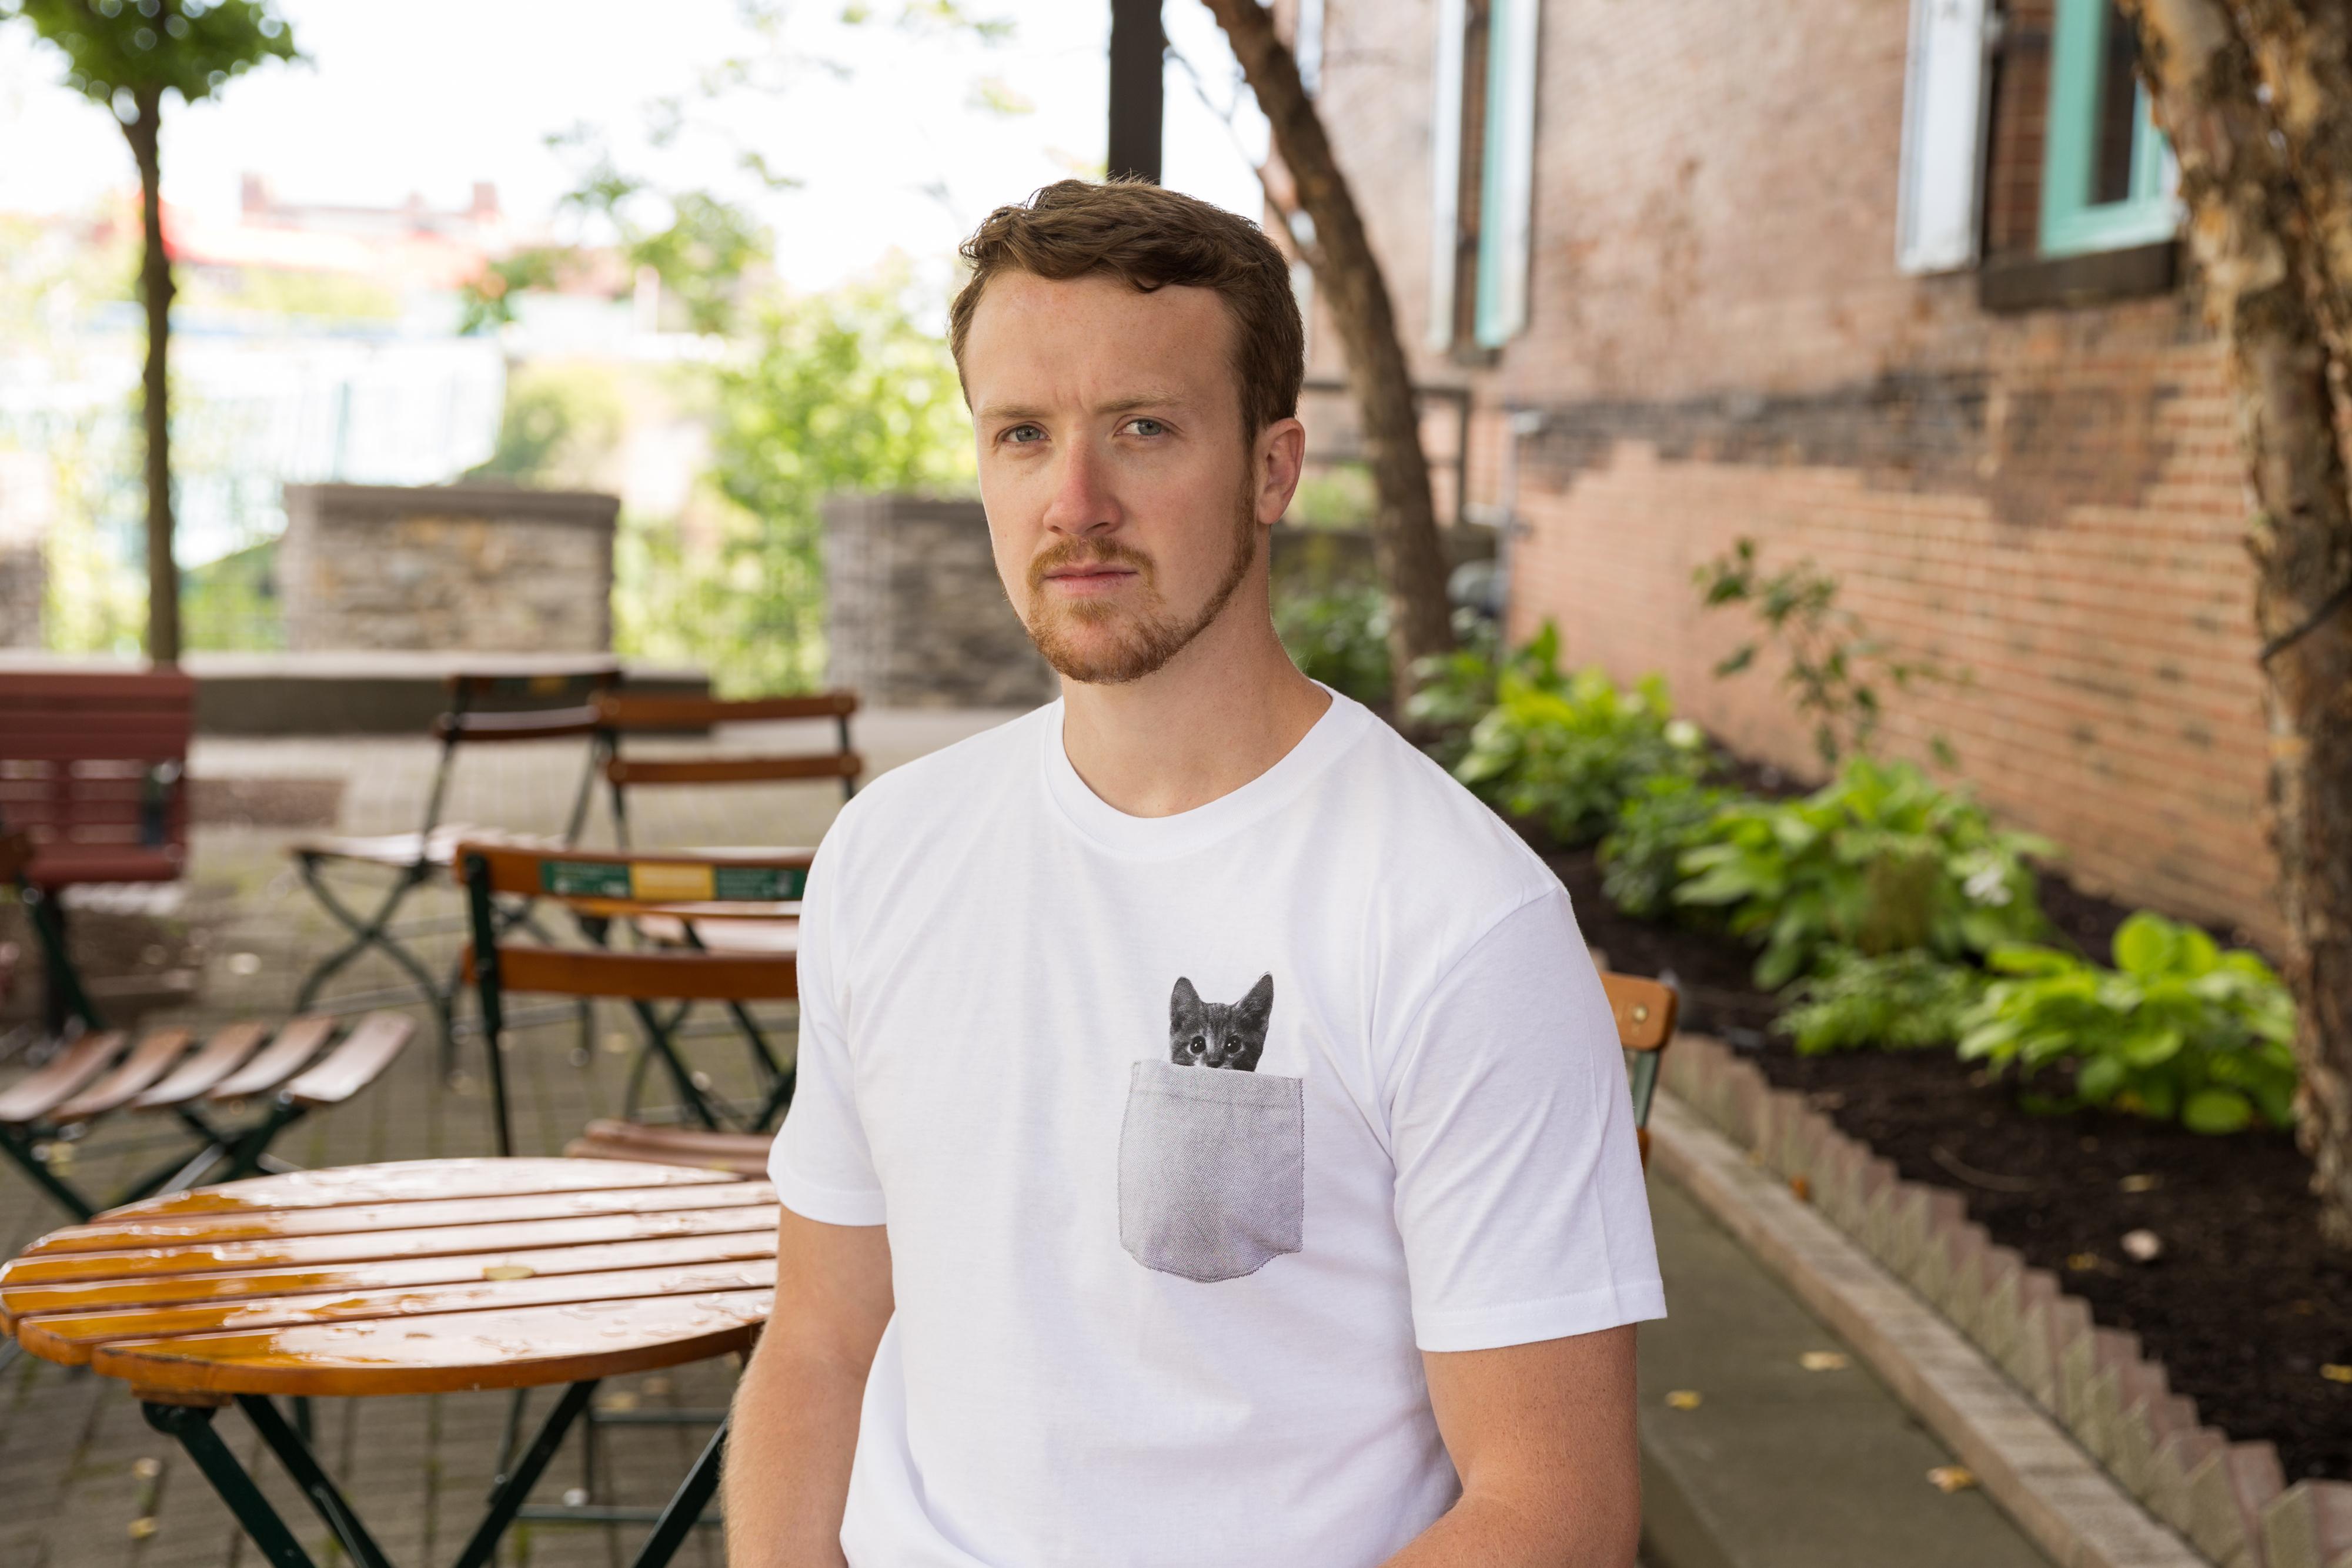 90e540ae2ee8 Mens Pocket Cat T Shirt Funny Printed Peeking Pet Kitten Animal Tee ...